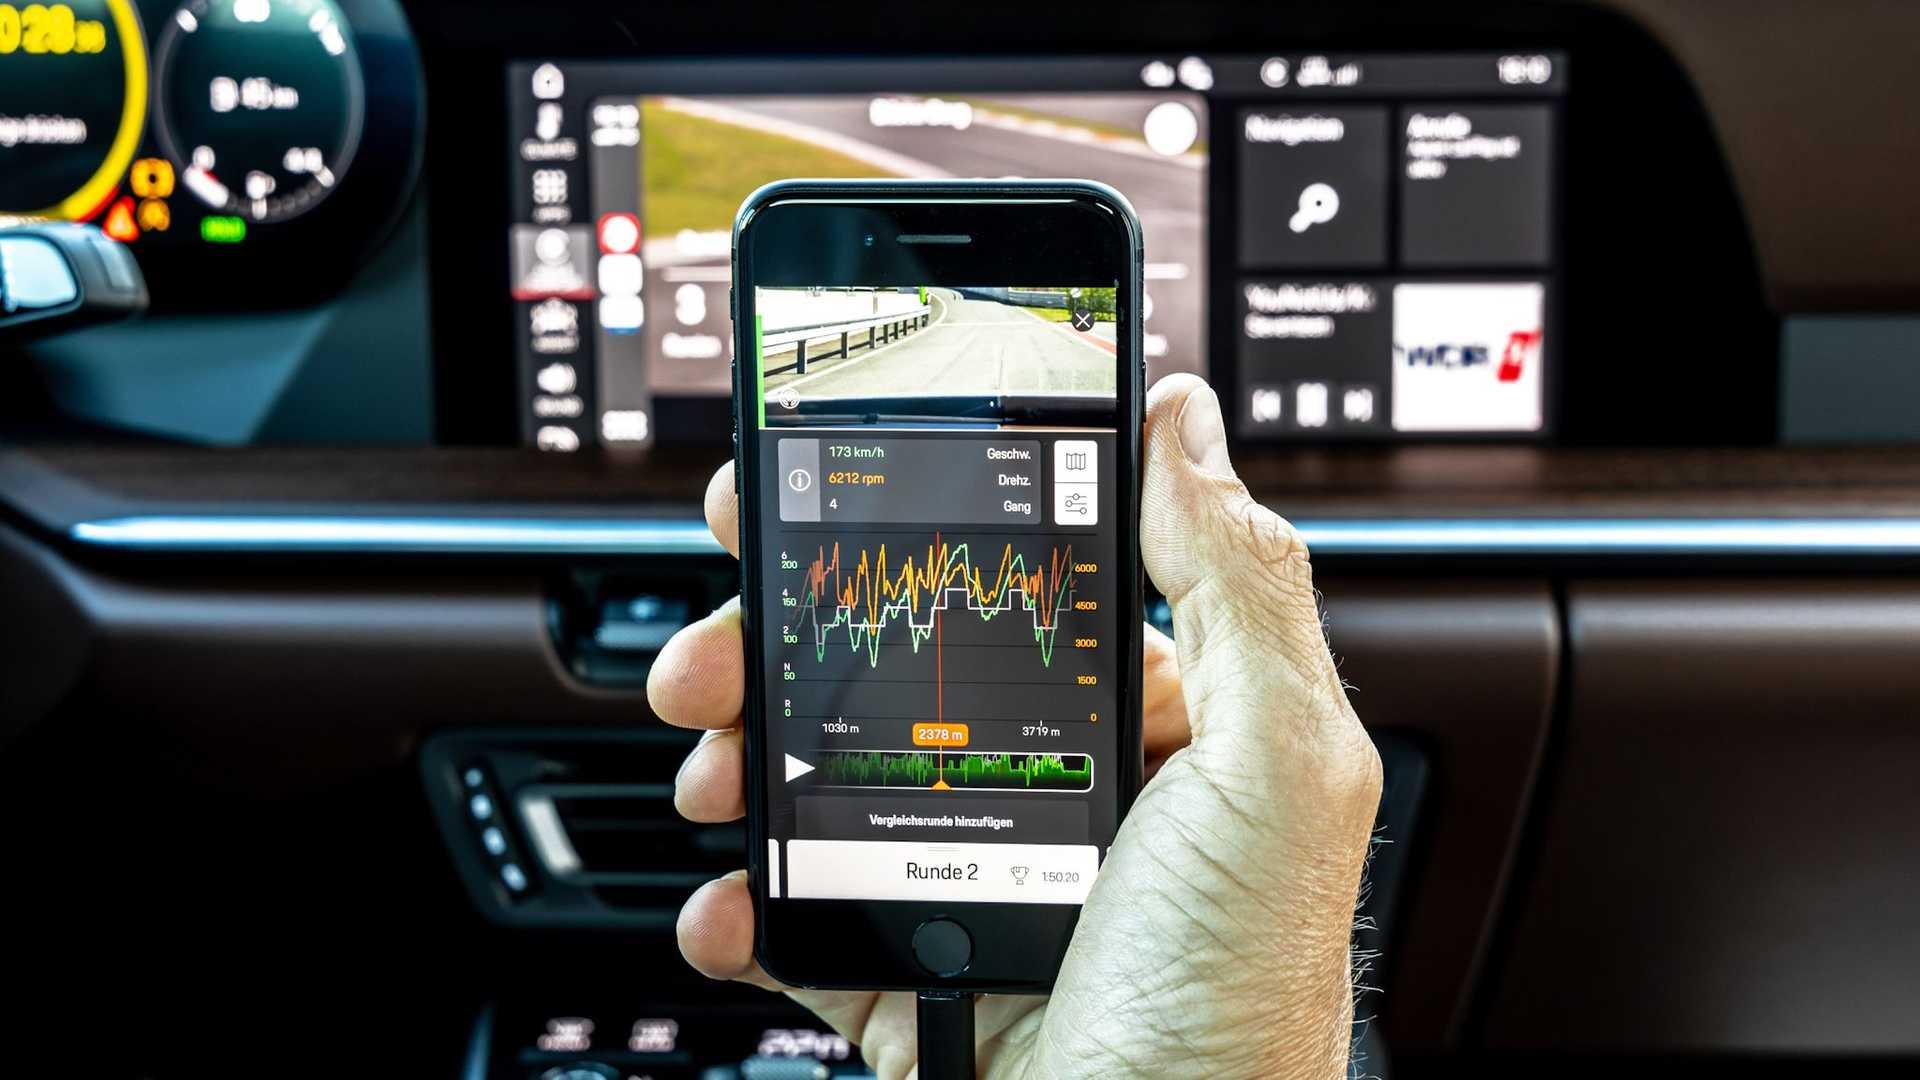 Porsche-Communication-Management-6-13